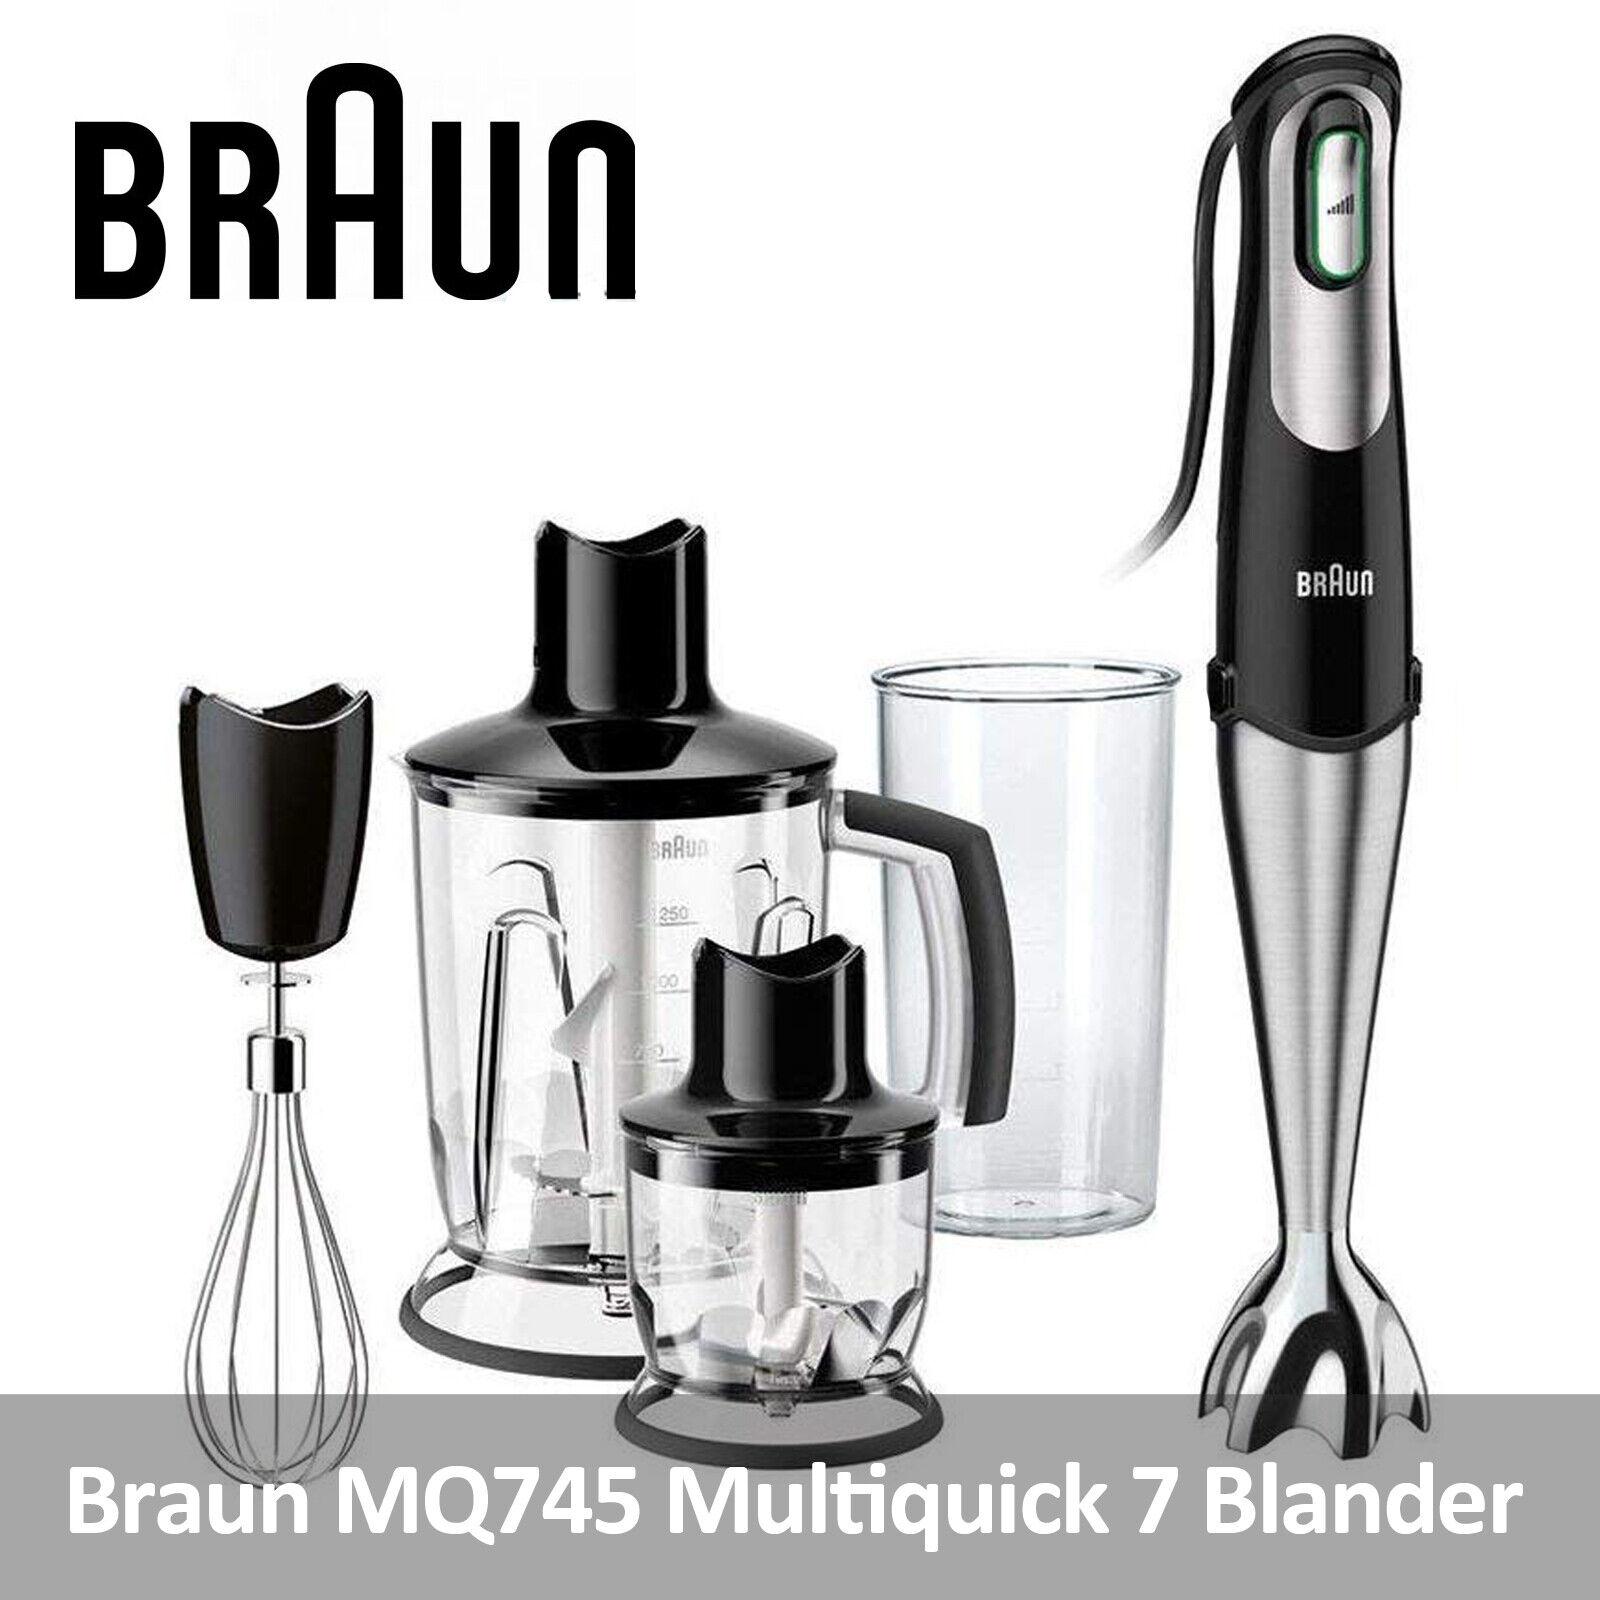 Braun Multiquick 7 Hand Blender Chopper Whisk Jug With Splash Control 750w Mq745 For Sale Online Ebay